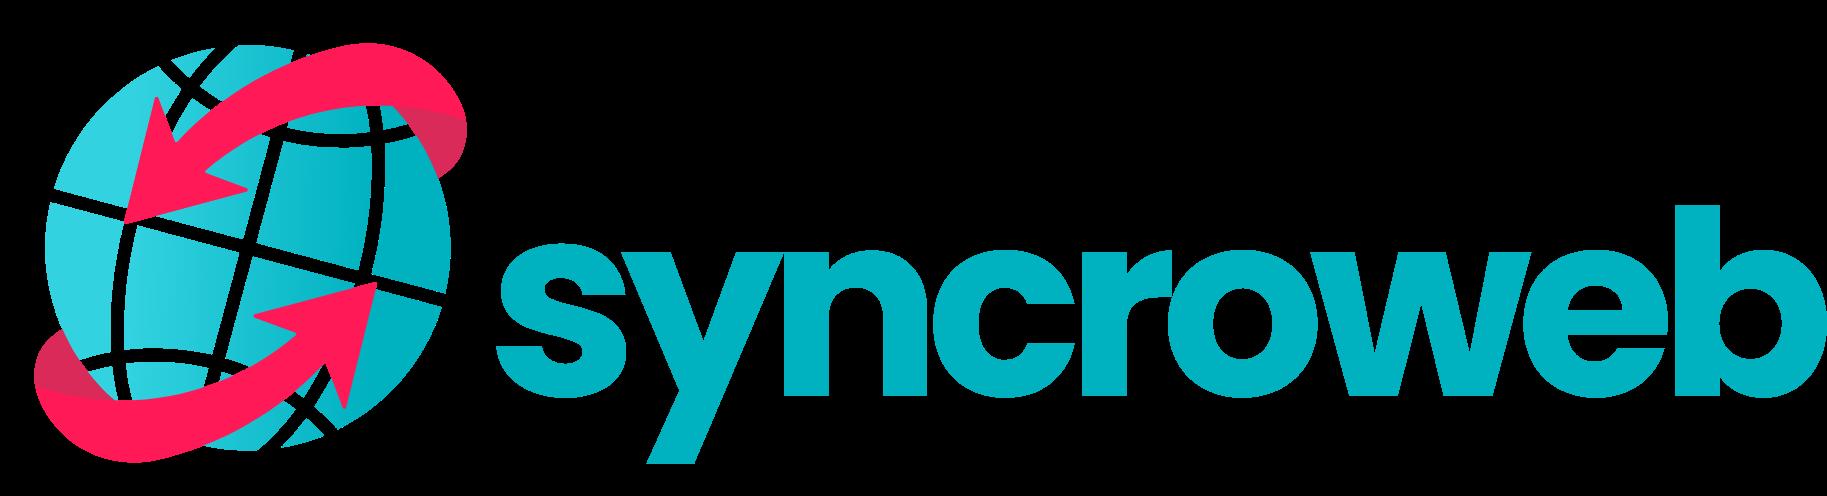 Syncroweb